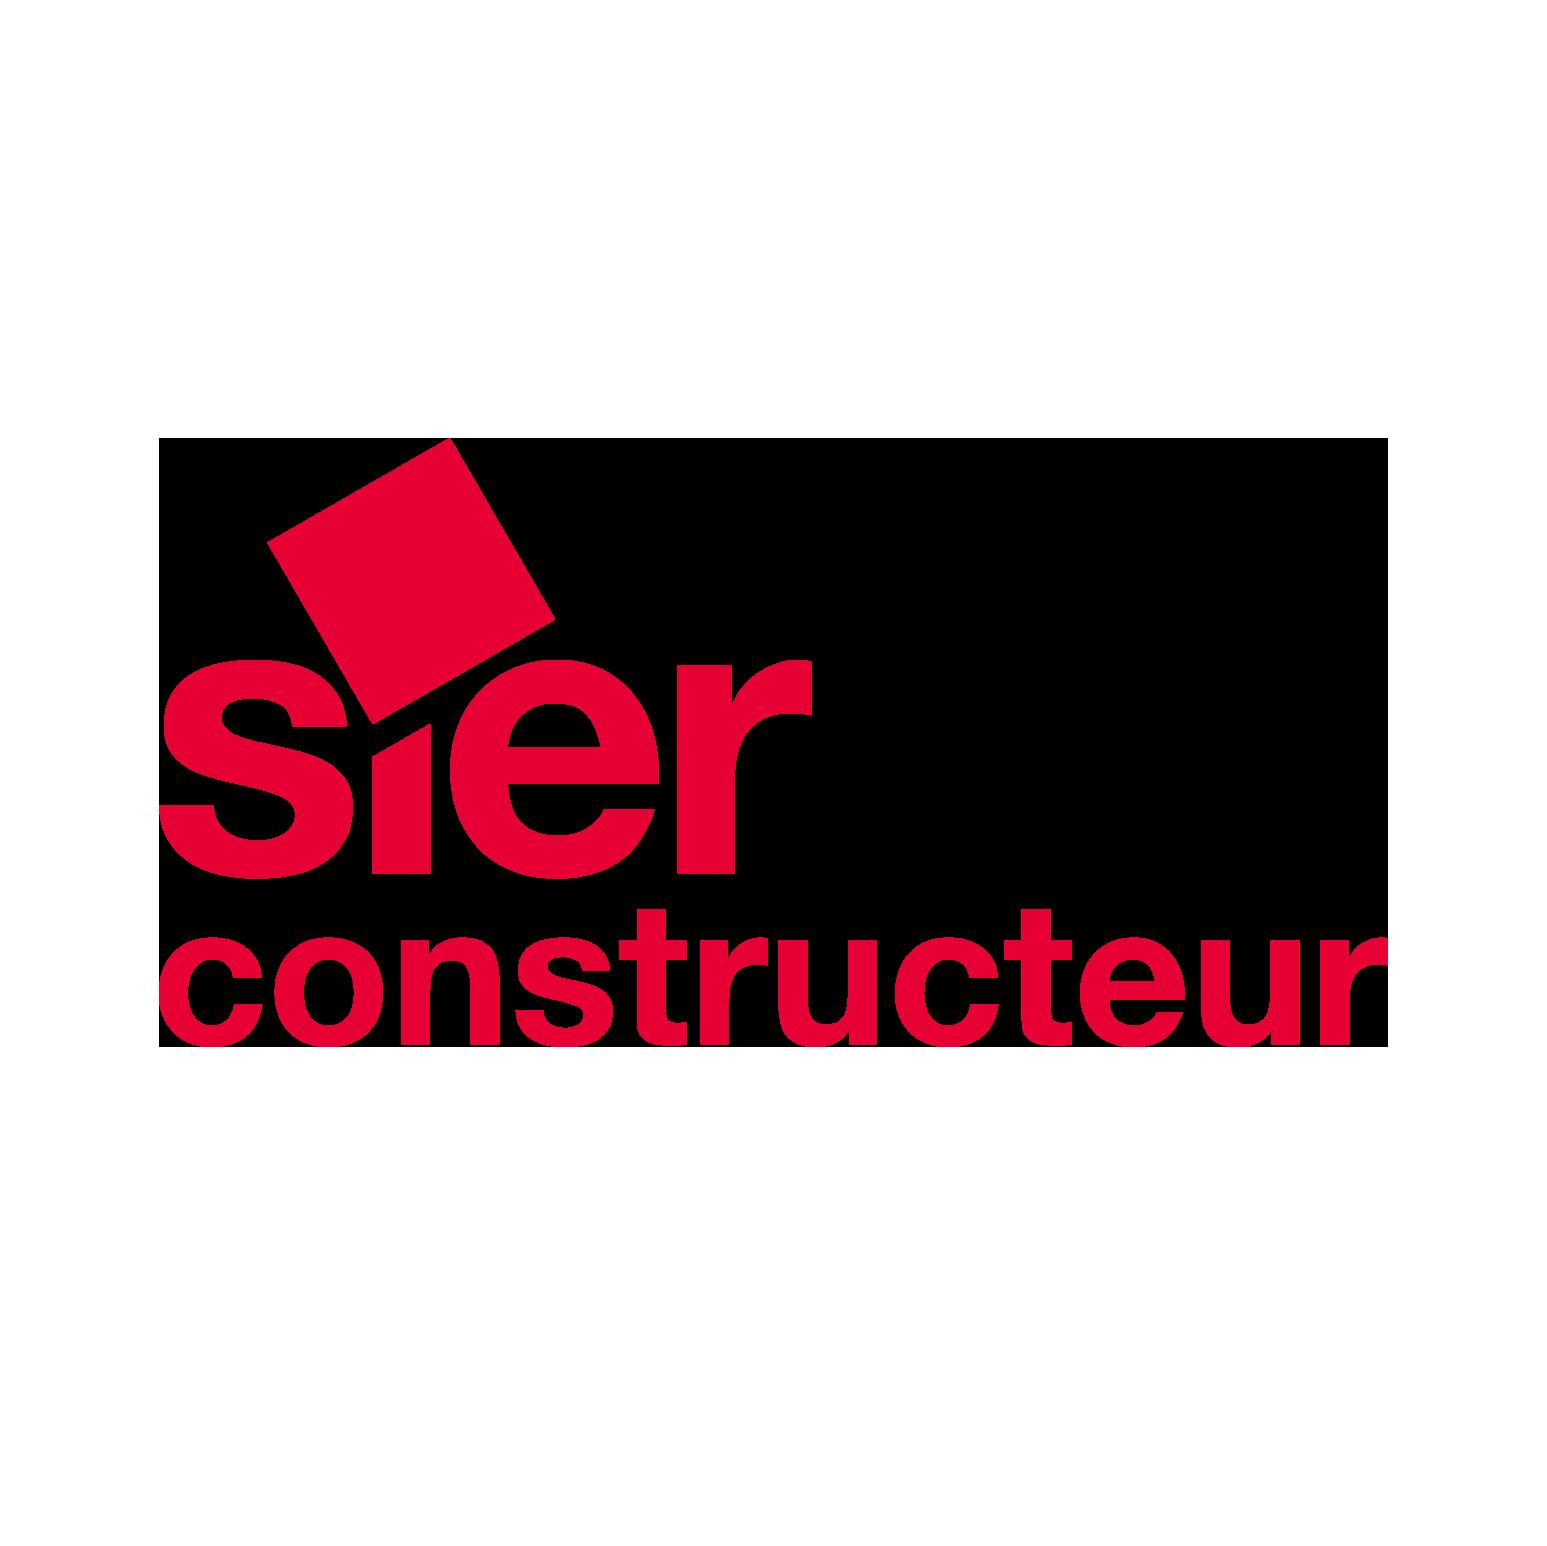 SIER constructeur